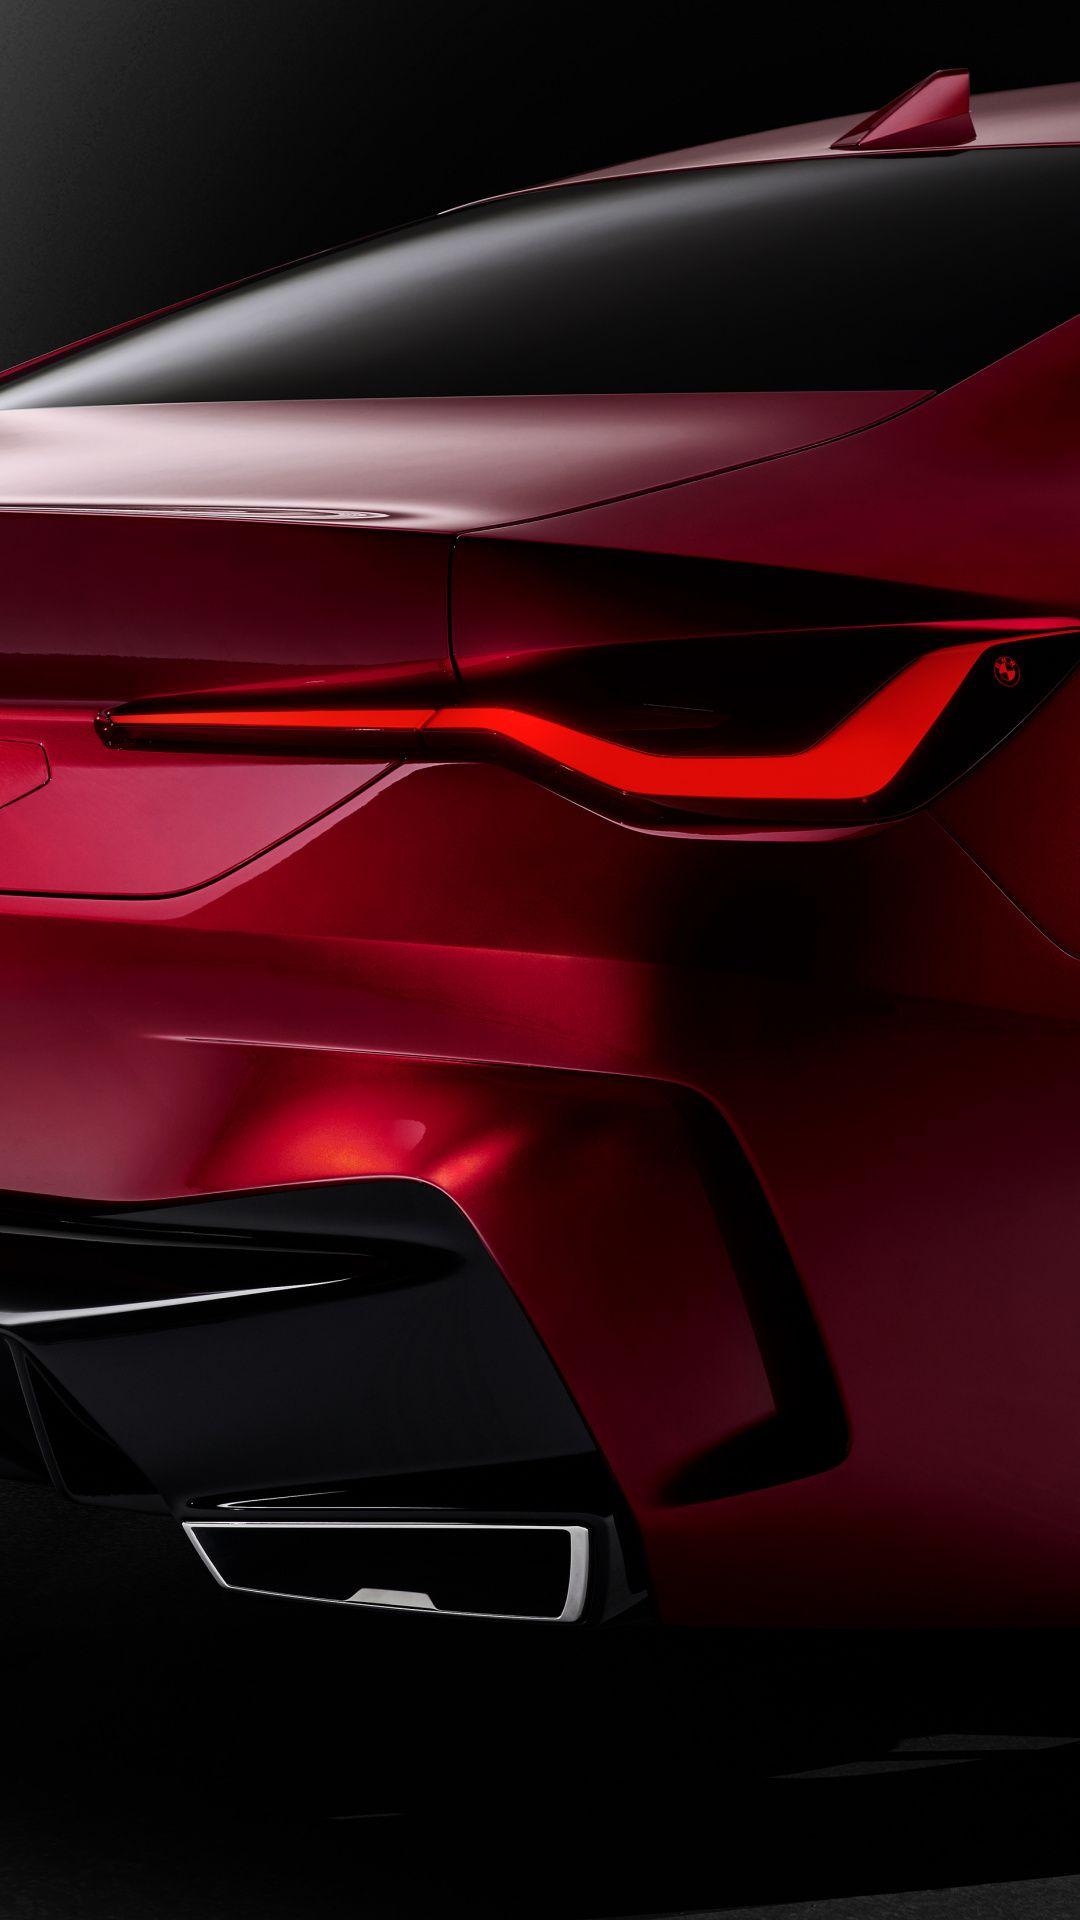 1080x1920 Tail Light Bmw Concept 4 Red Wallpaper Bmw Concept Bmw